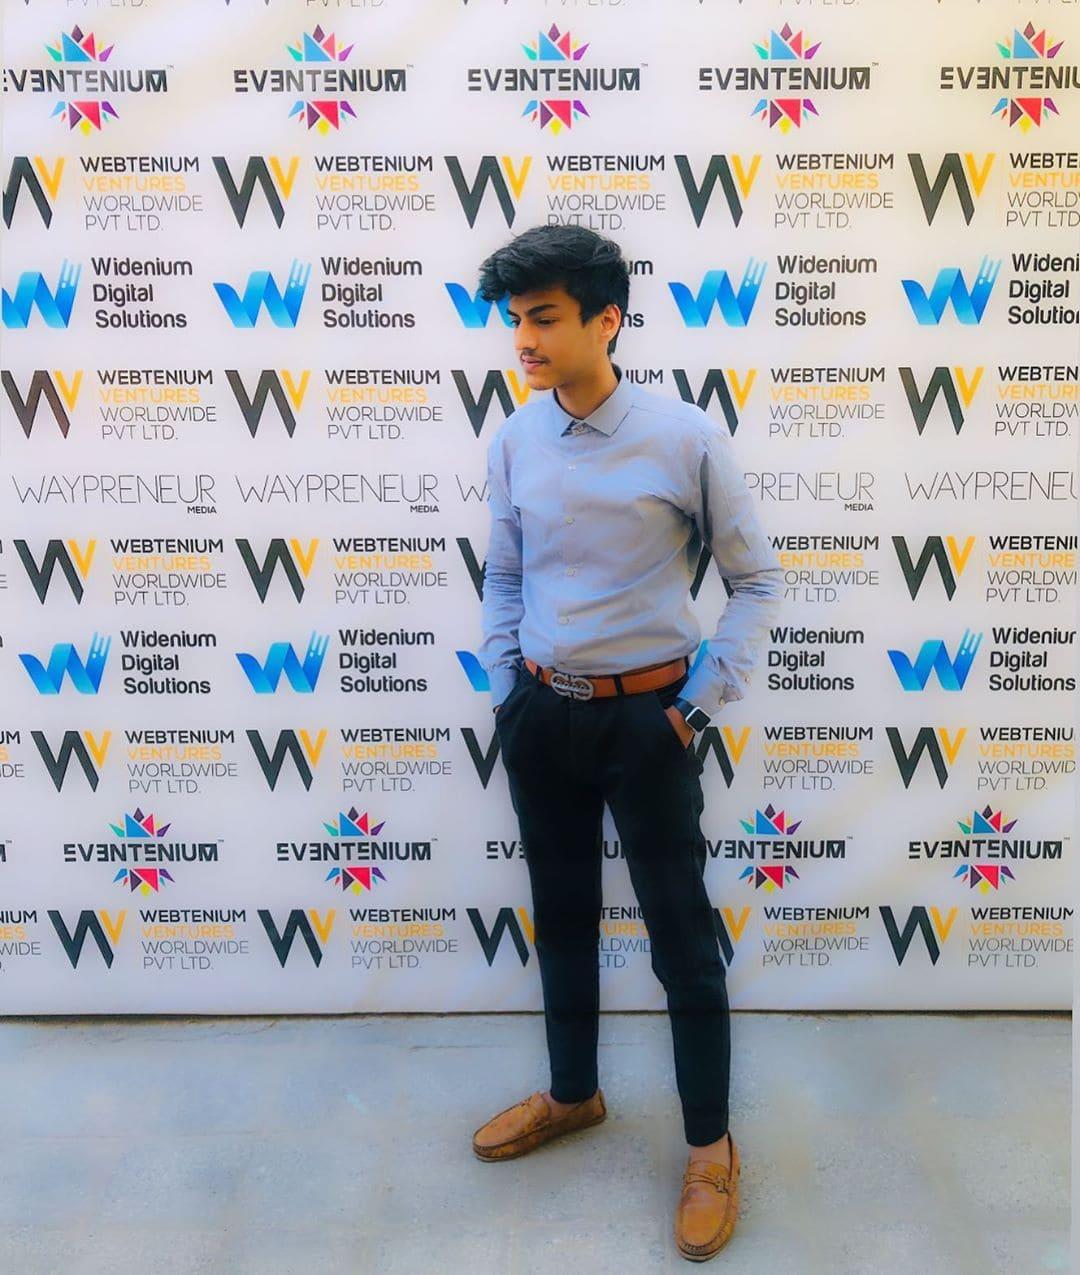 Siddhant Thakran (Digital Marketing Specialist) Biography, Age, Wiki, Birthday & More